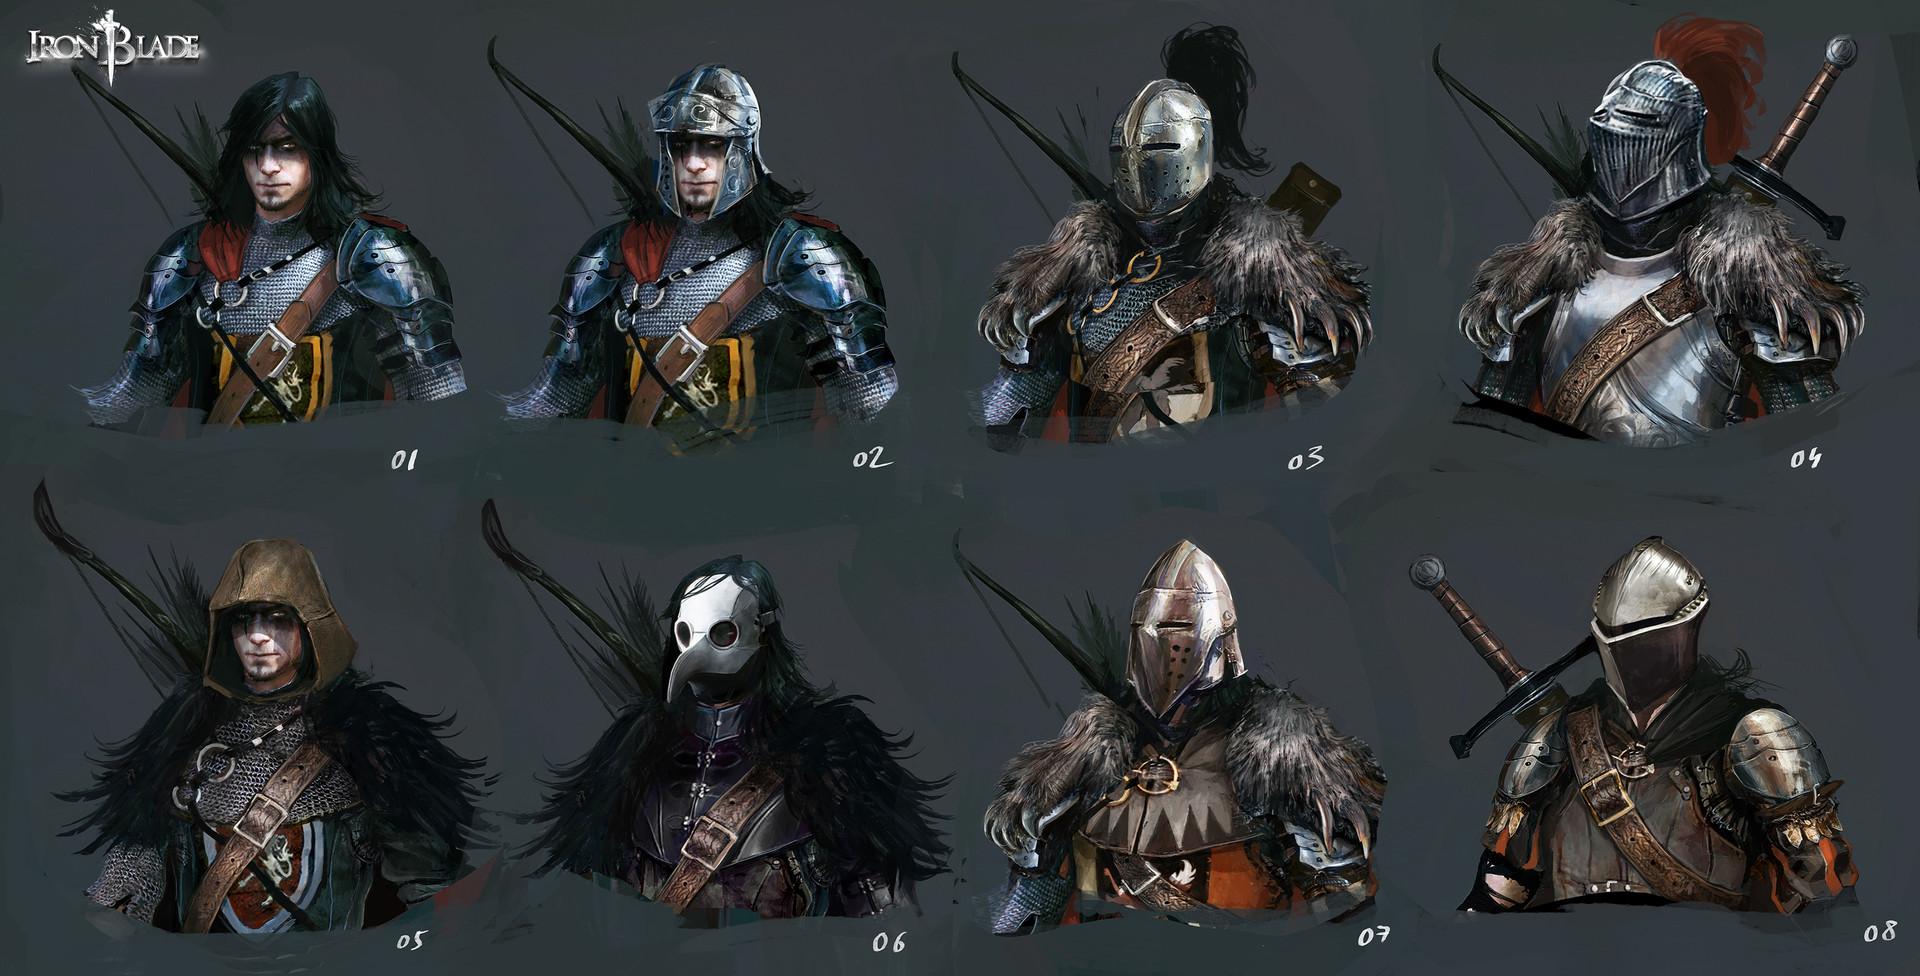 Alexandre chaudret hf armorset helmet01